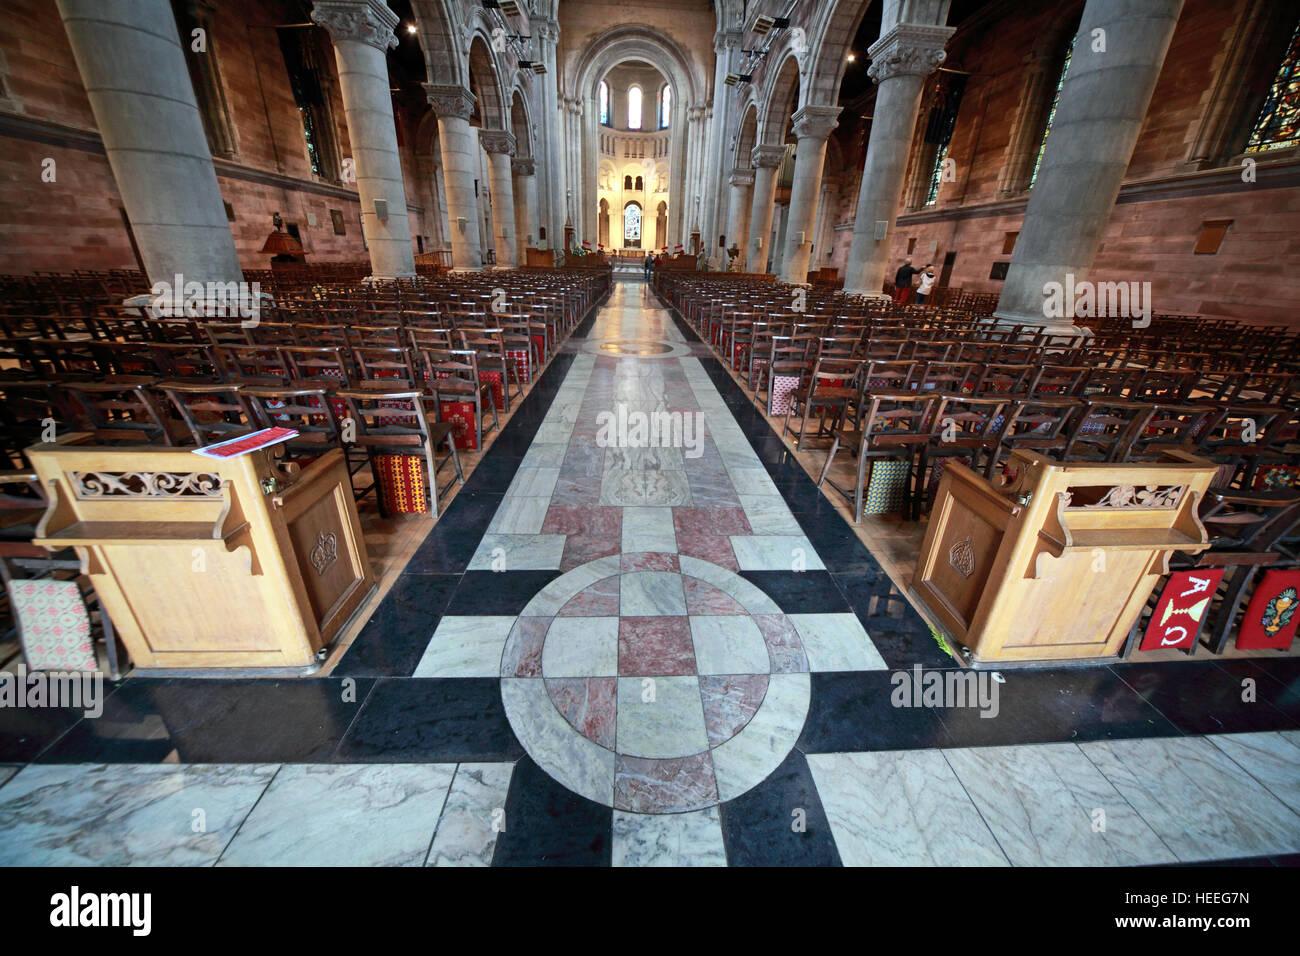 Laden Sie dieses Alamy Stockfoto St Annes Belfast Cathedral Interior, Pano, - HEEG7N